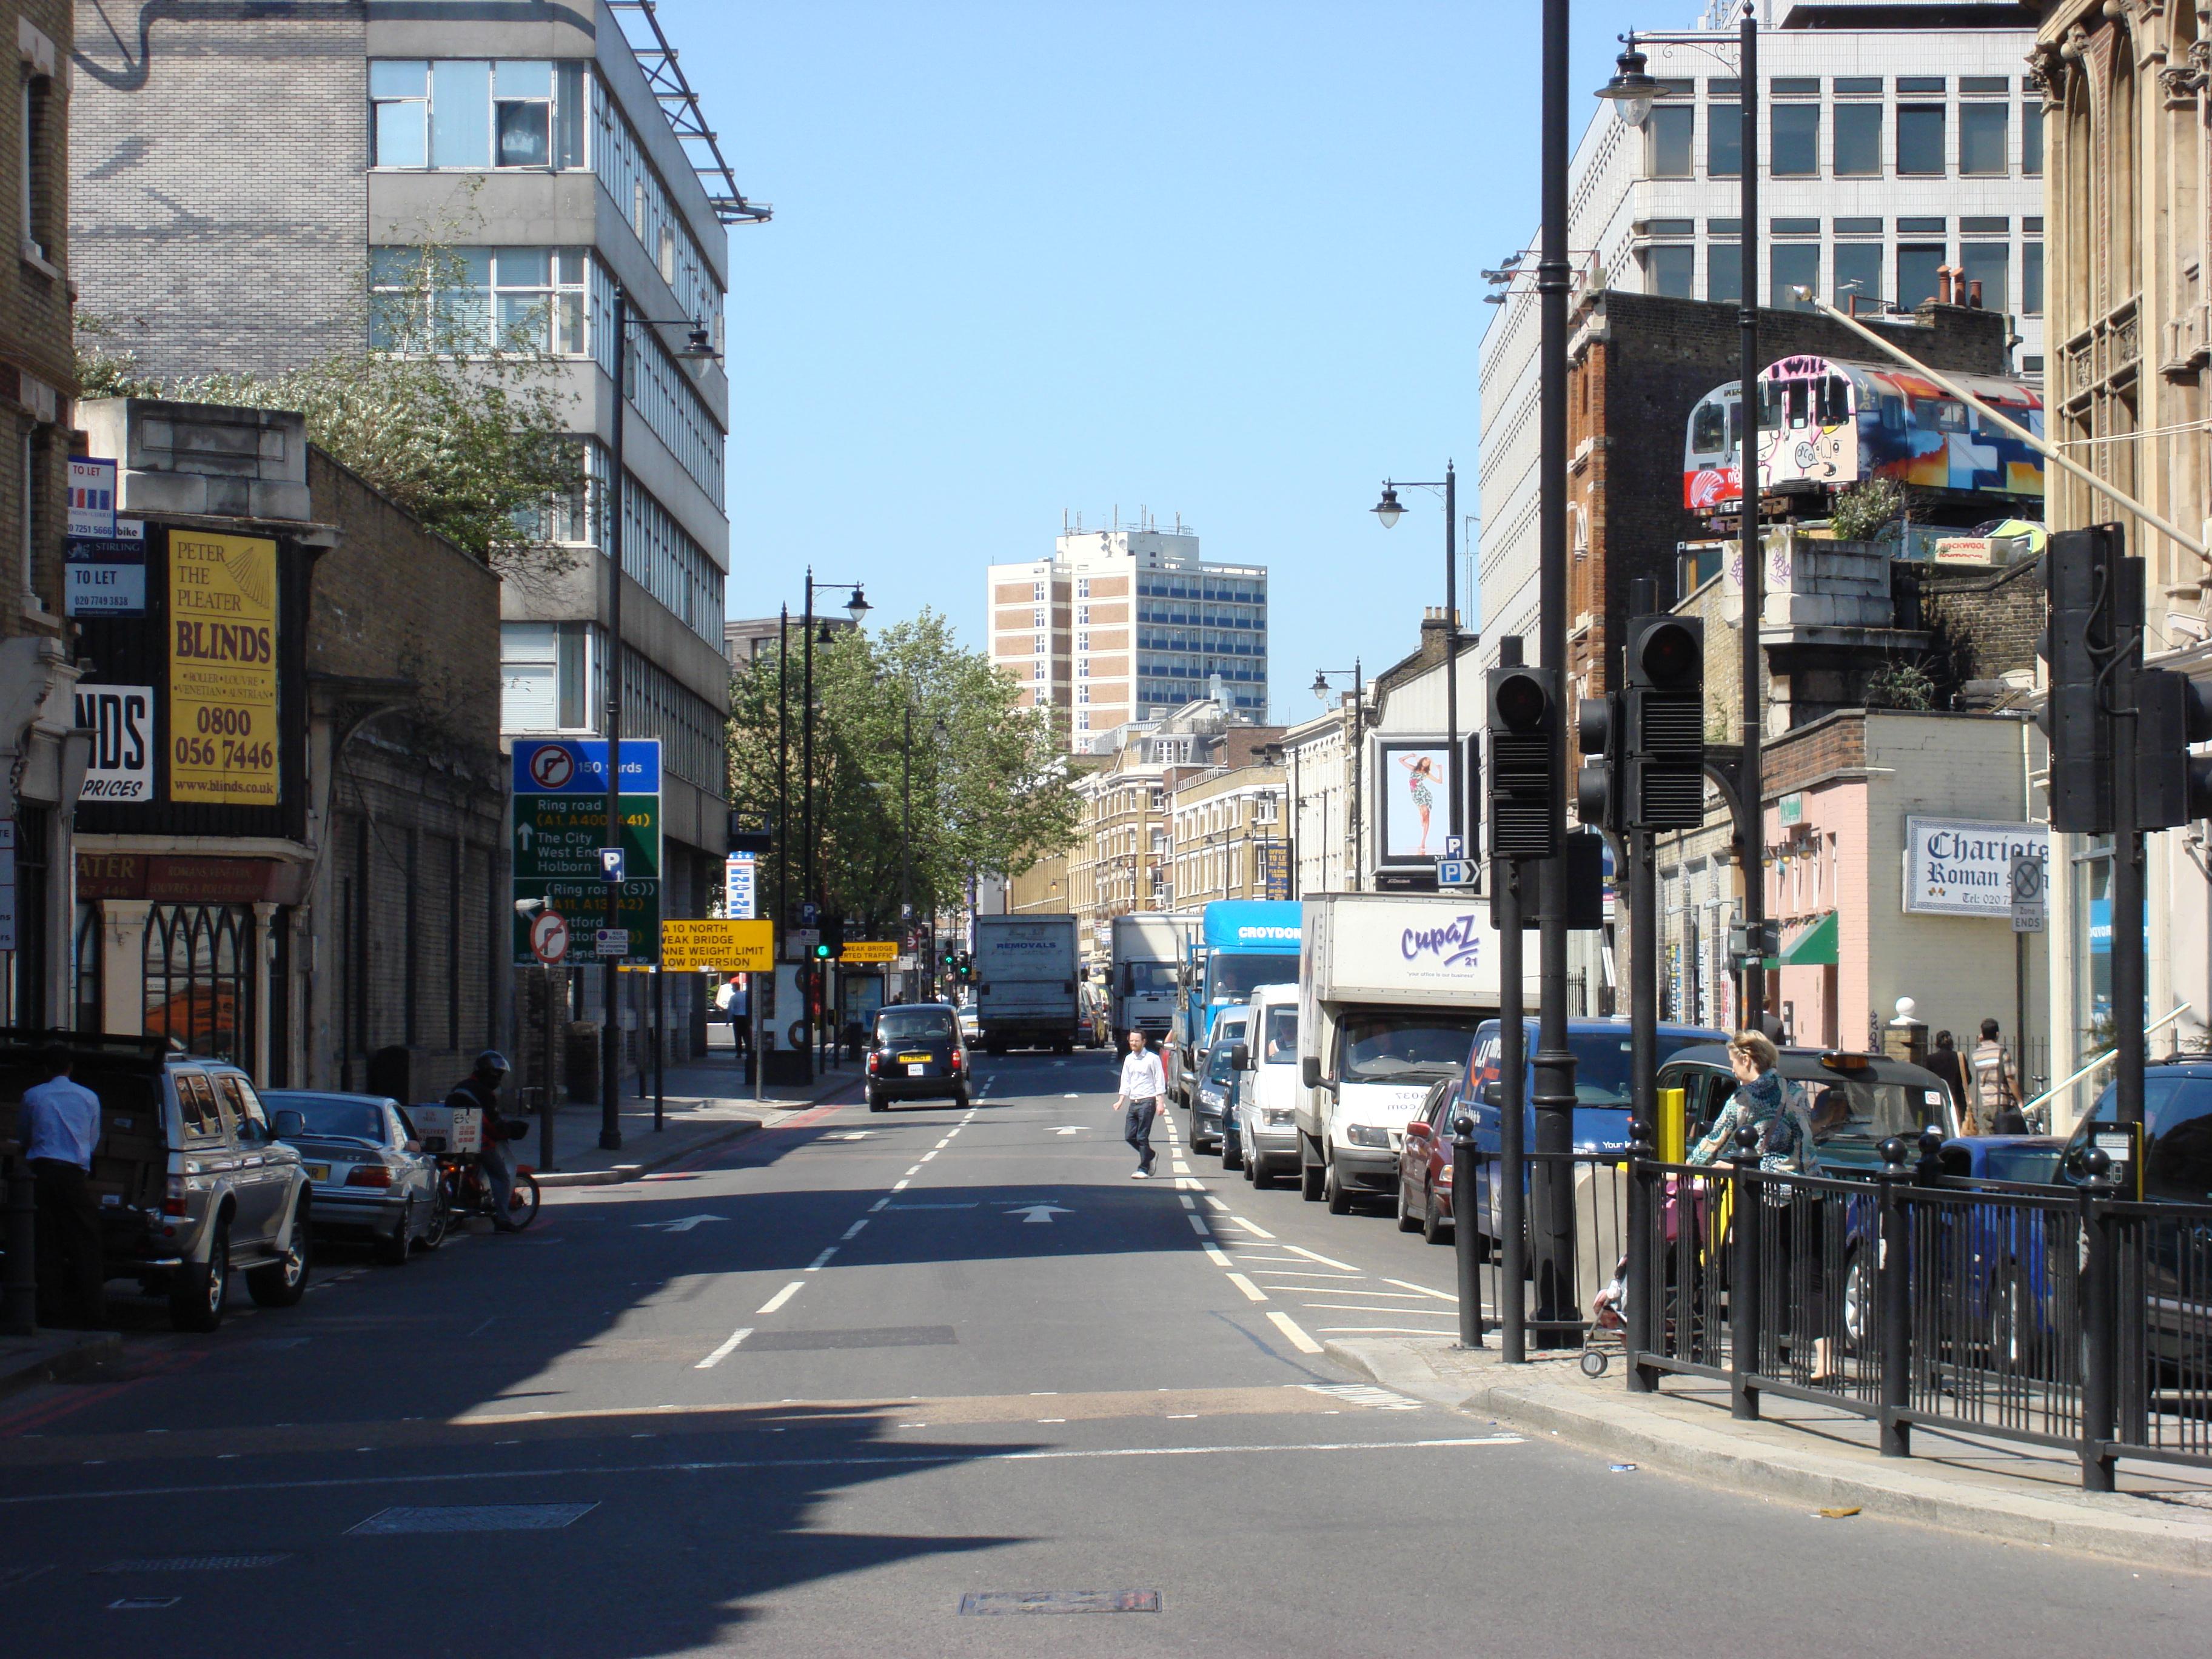 File:Great Eastern Street London from Shoreditch High Street.jpg